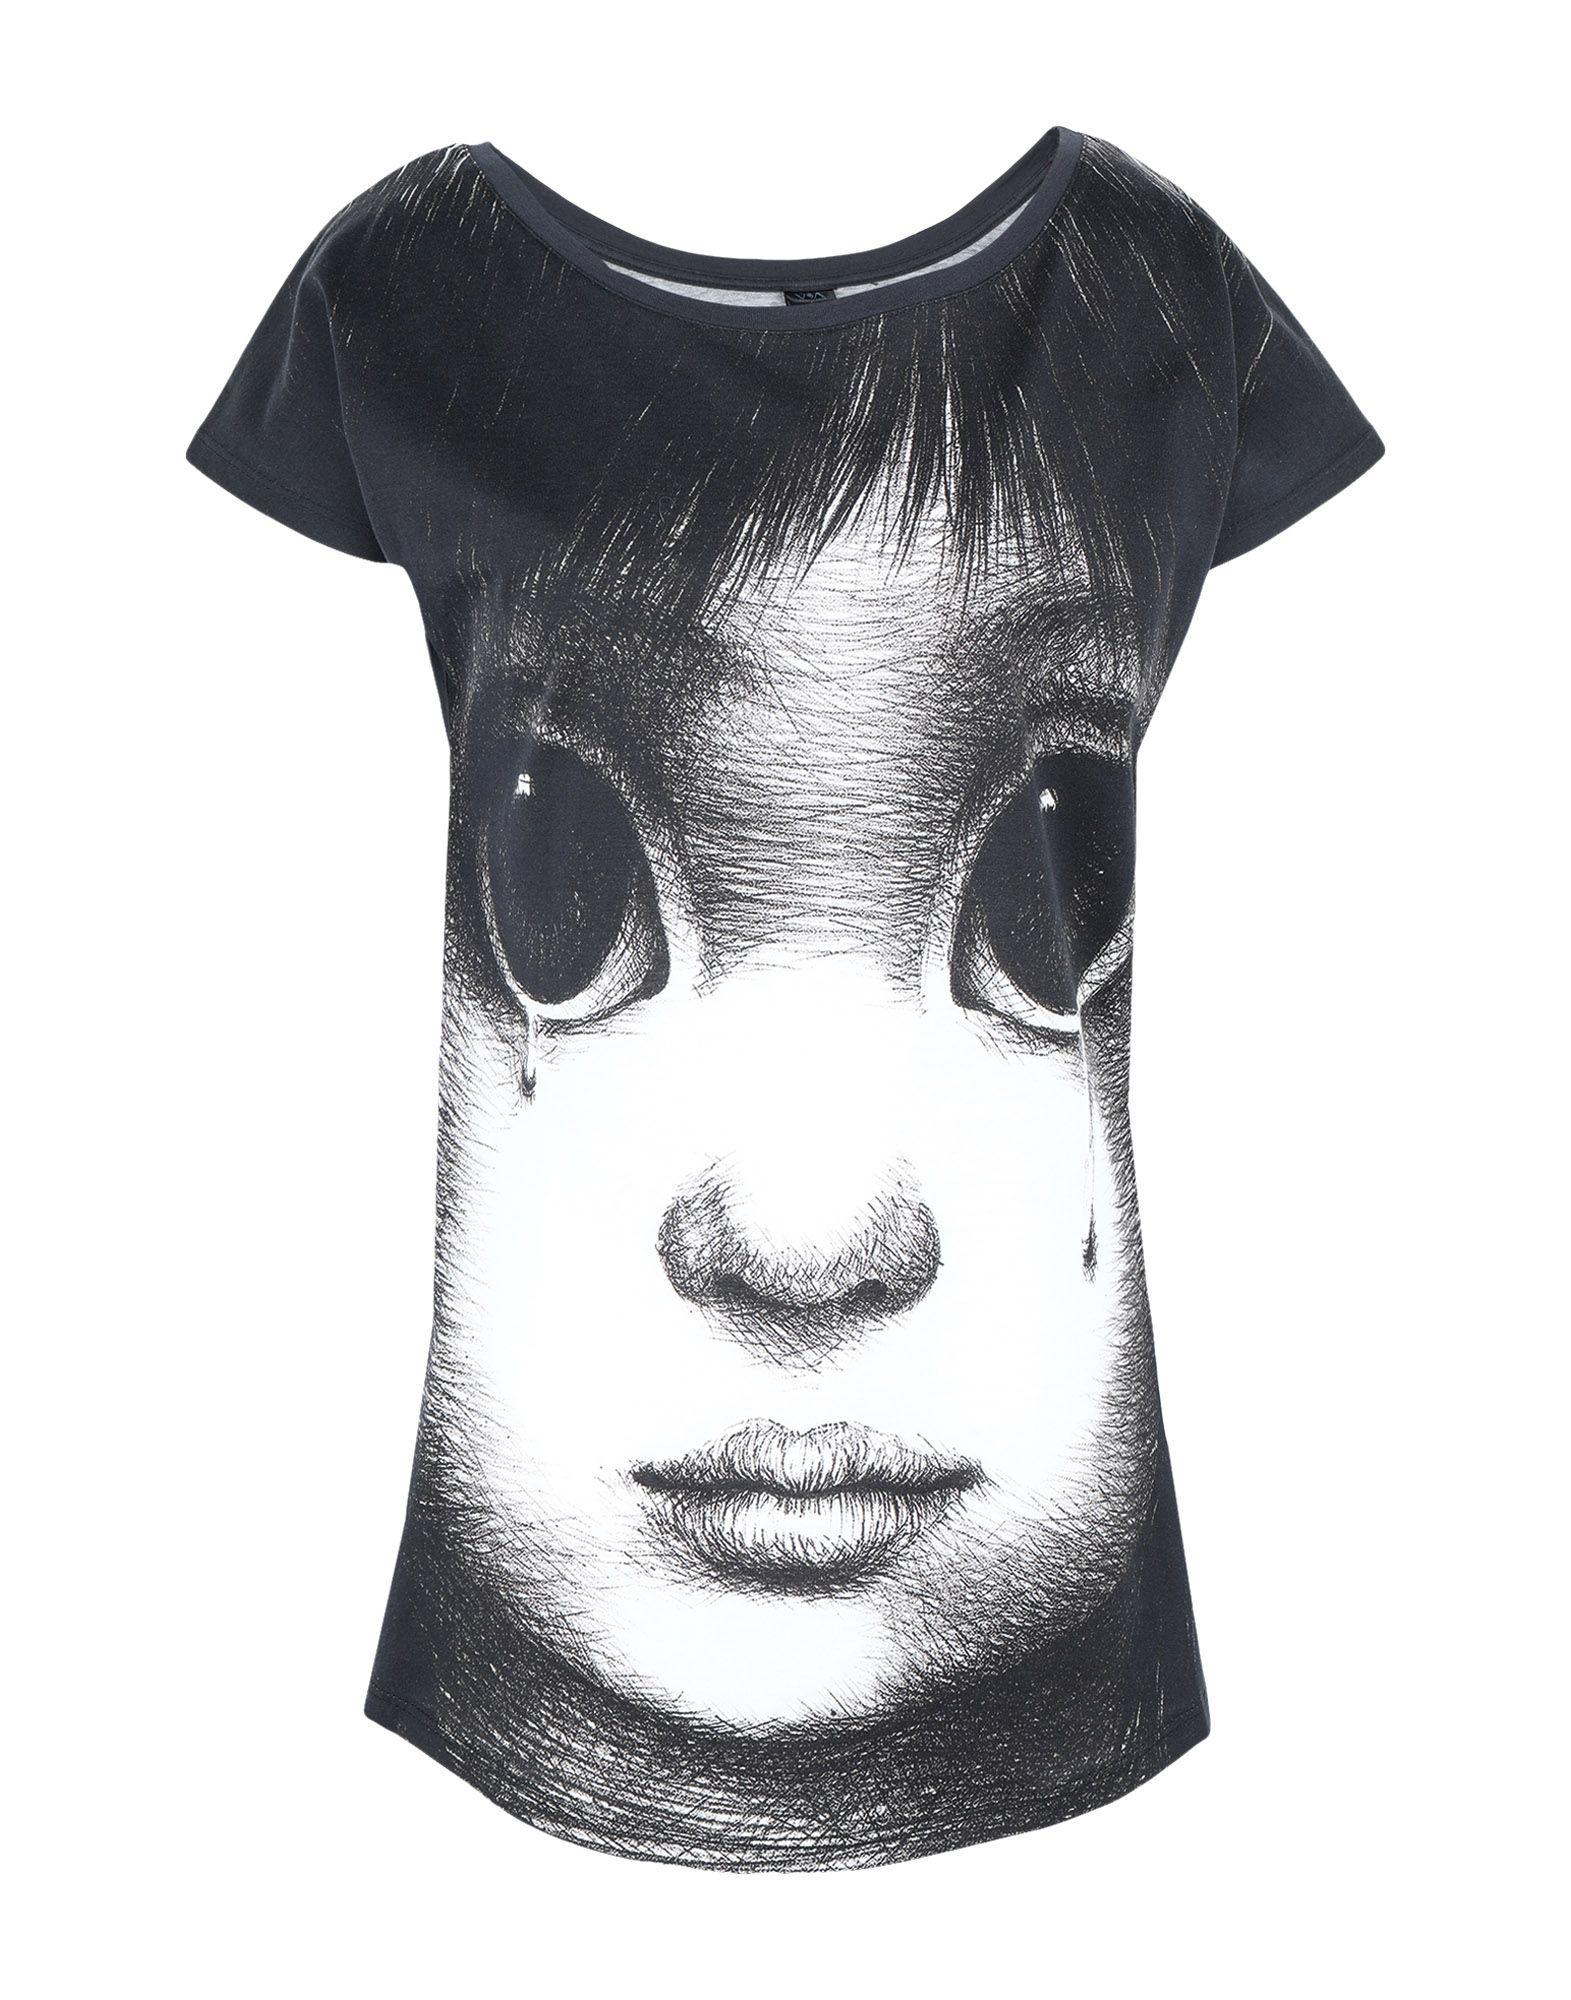 T-Shirt Vesti Vesti Vesti L'arte donna - 12347061OB bf3